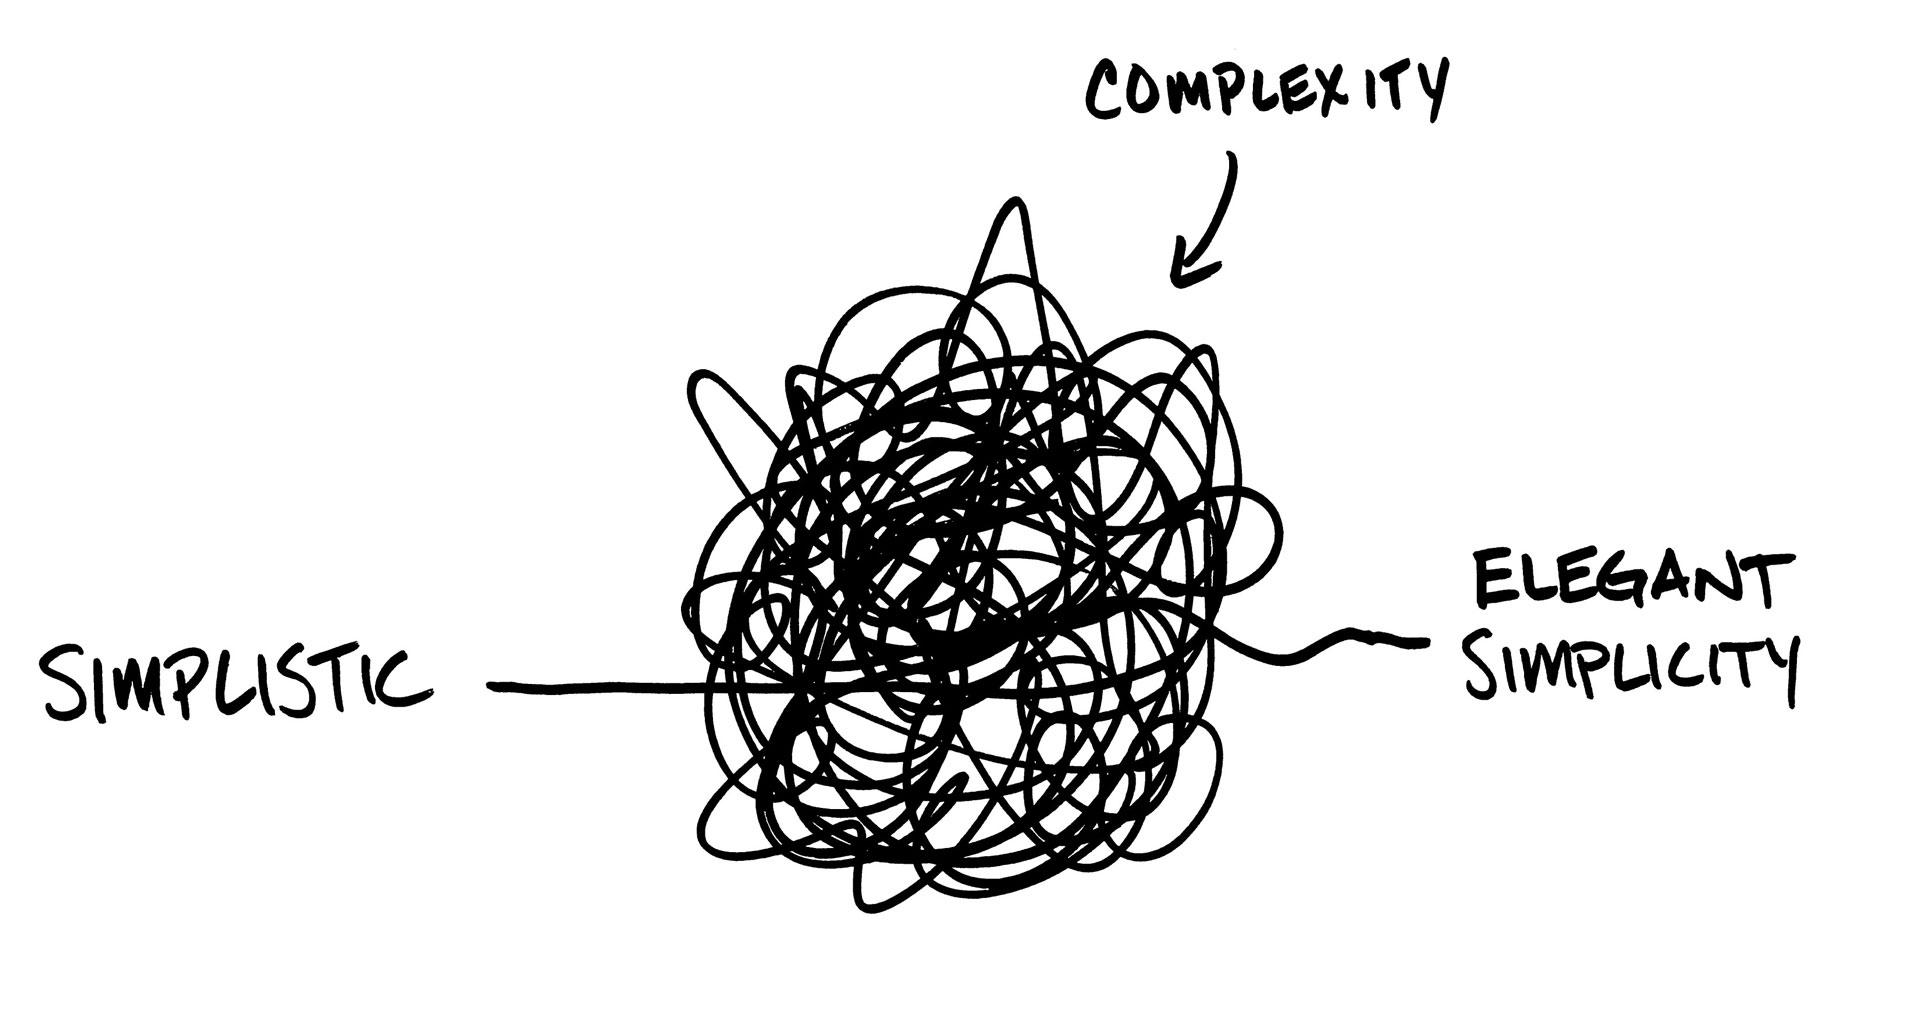 complexityelegantsimplicity